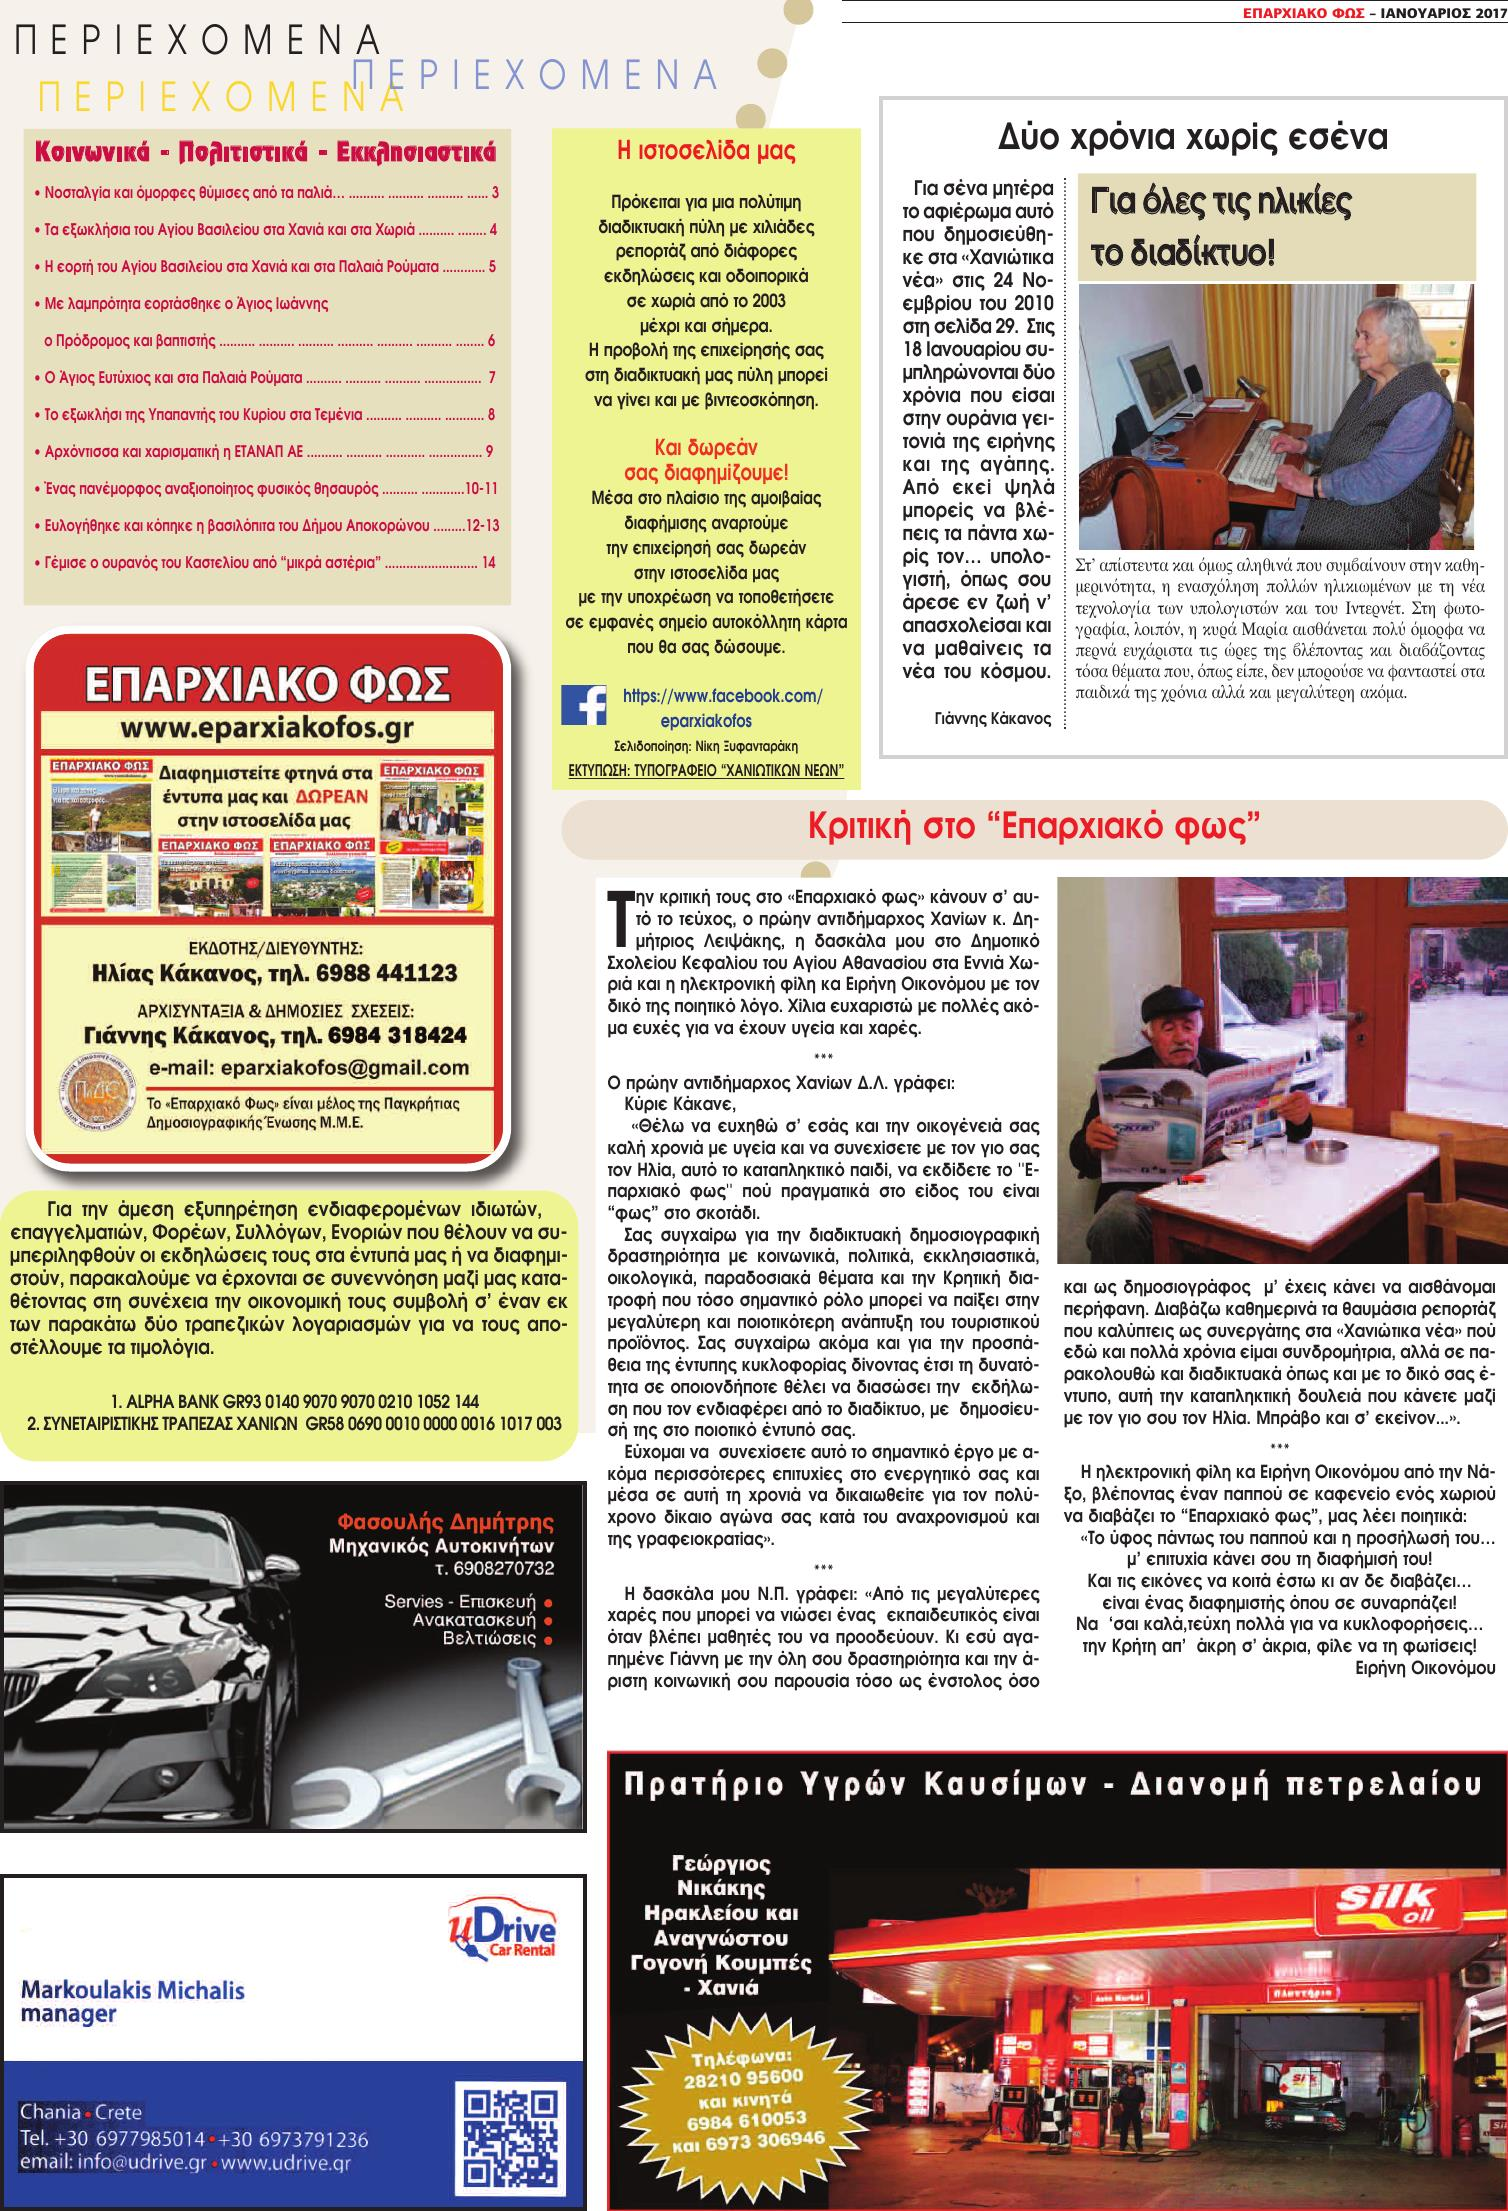 16 KAKANOS (Page 02)